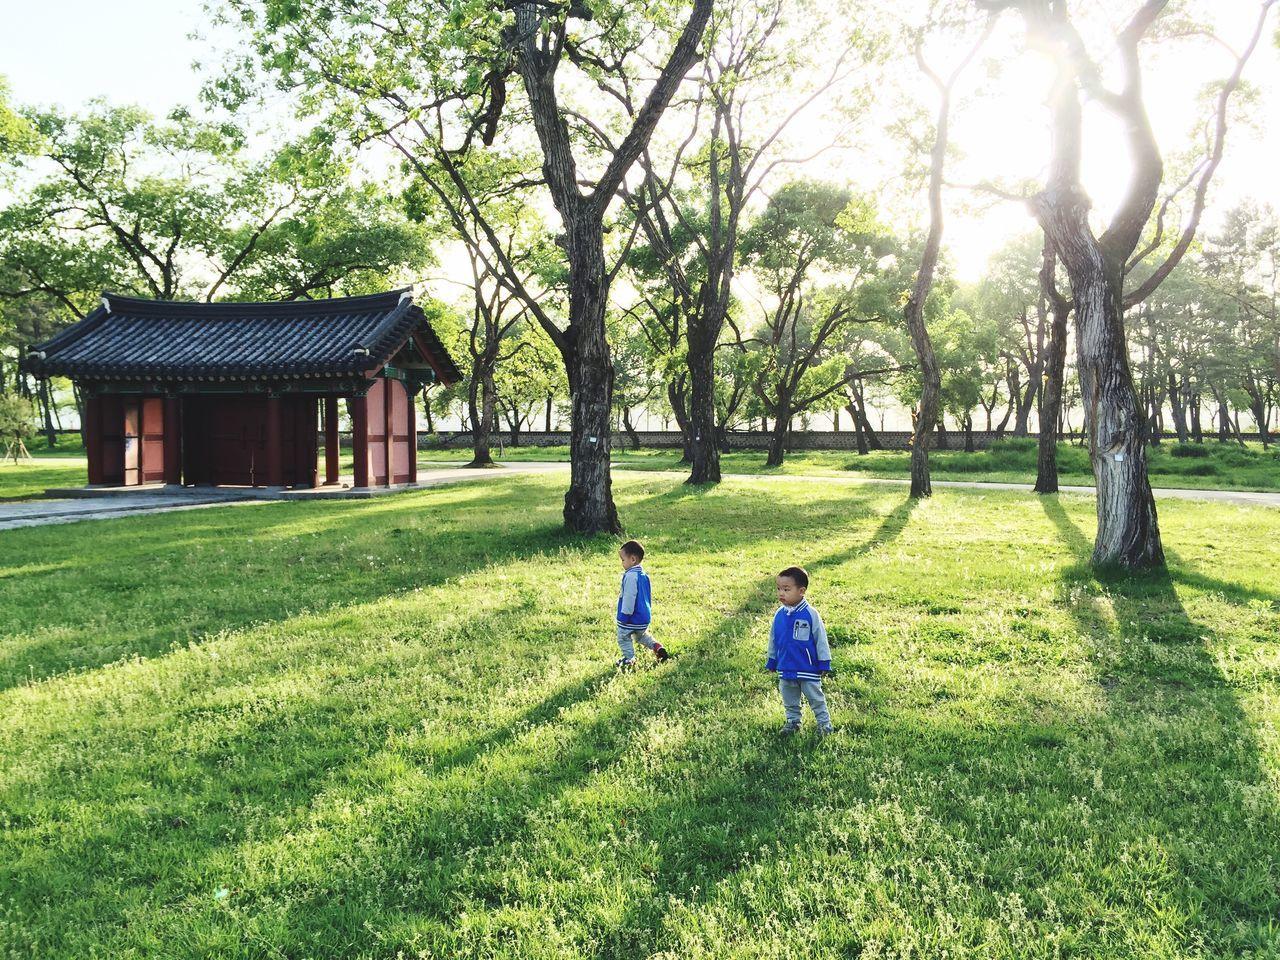 Siblings On Grassy Field Against Trees